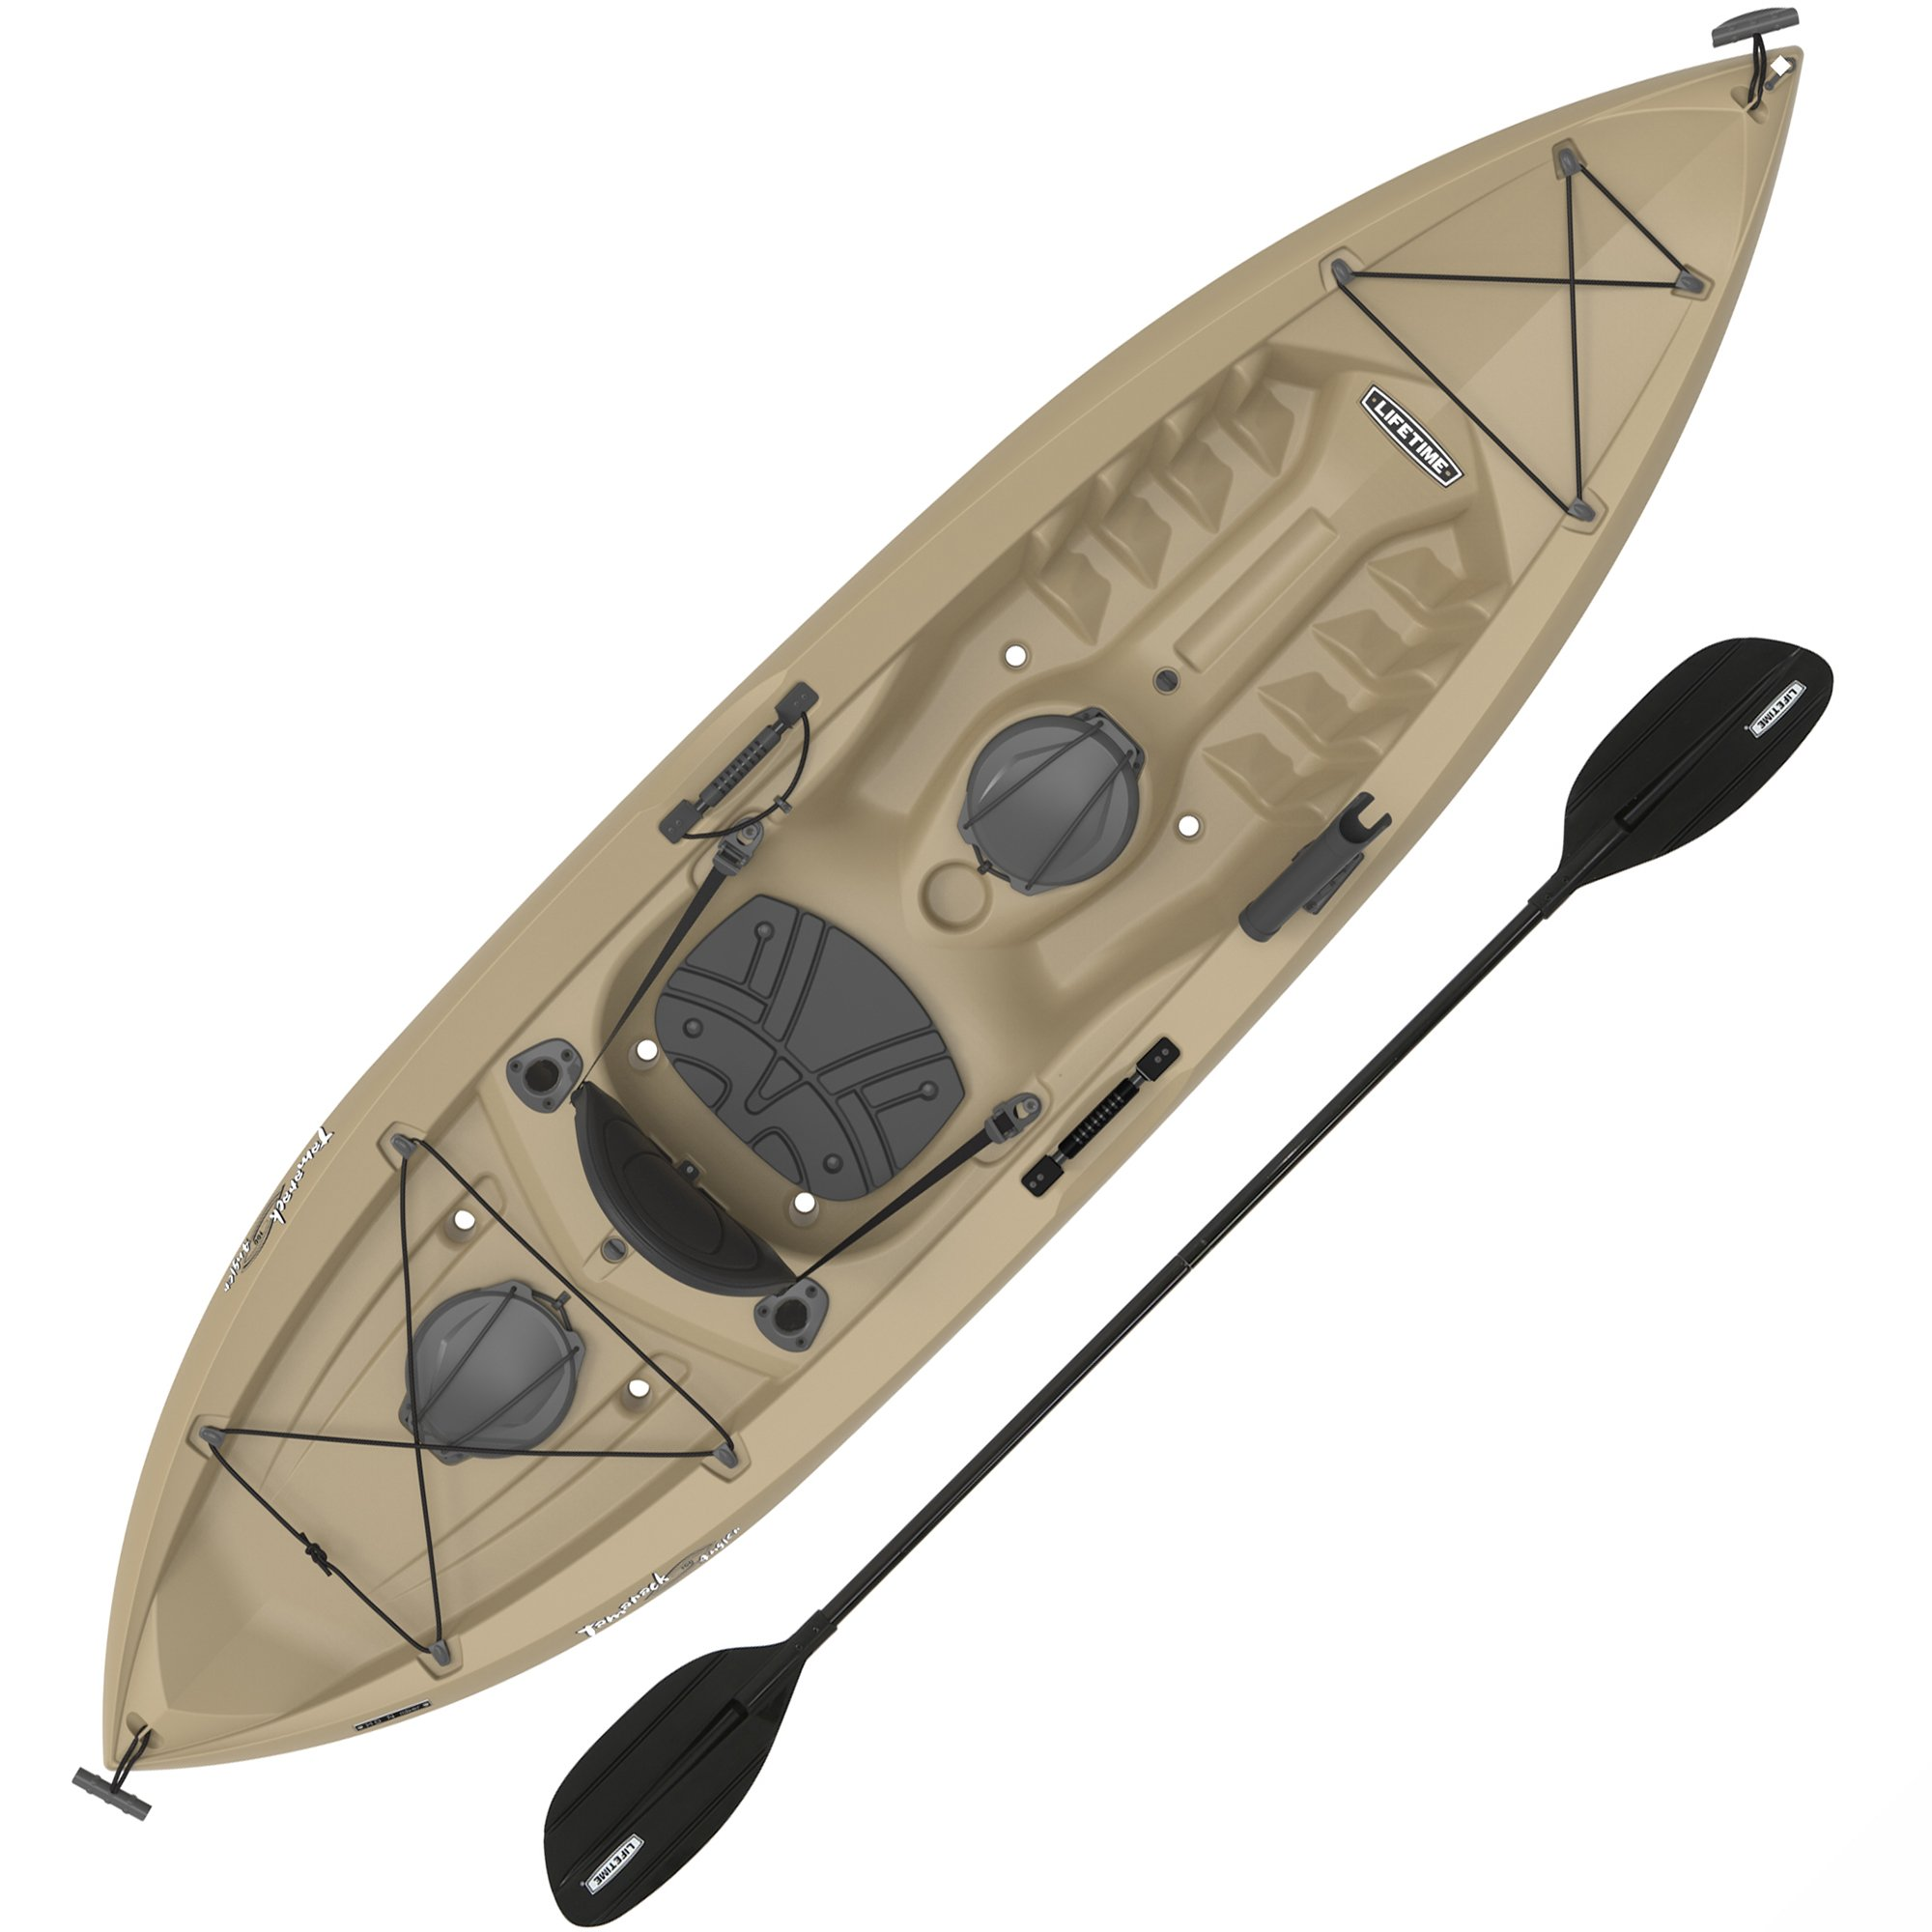 Lifetime Muskie Angler Sit-On-Top Kayak with Paddle, Tan, 120'' by Lifetime